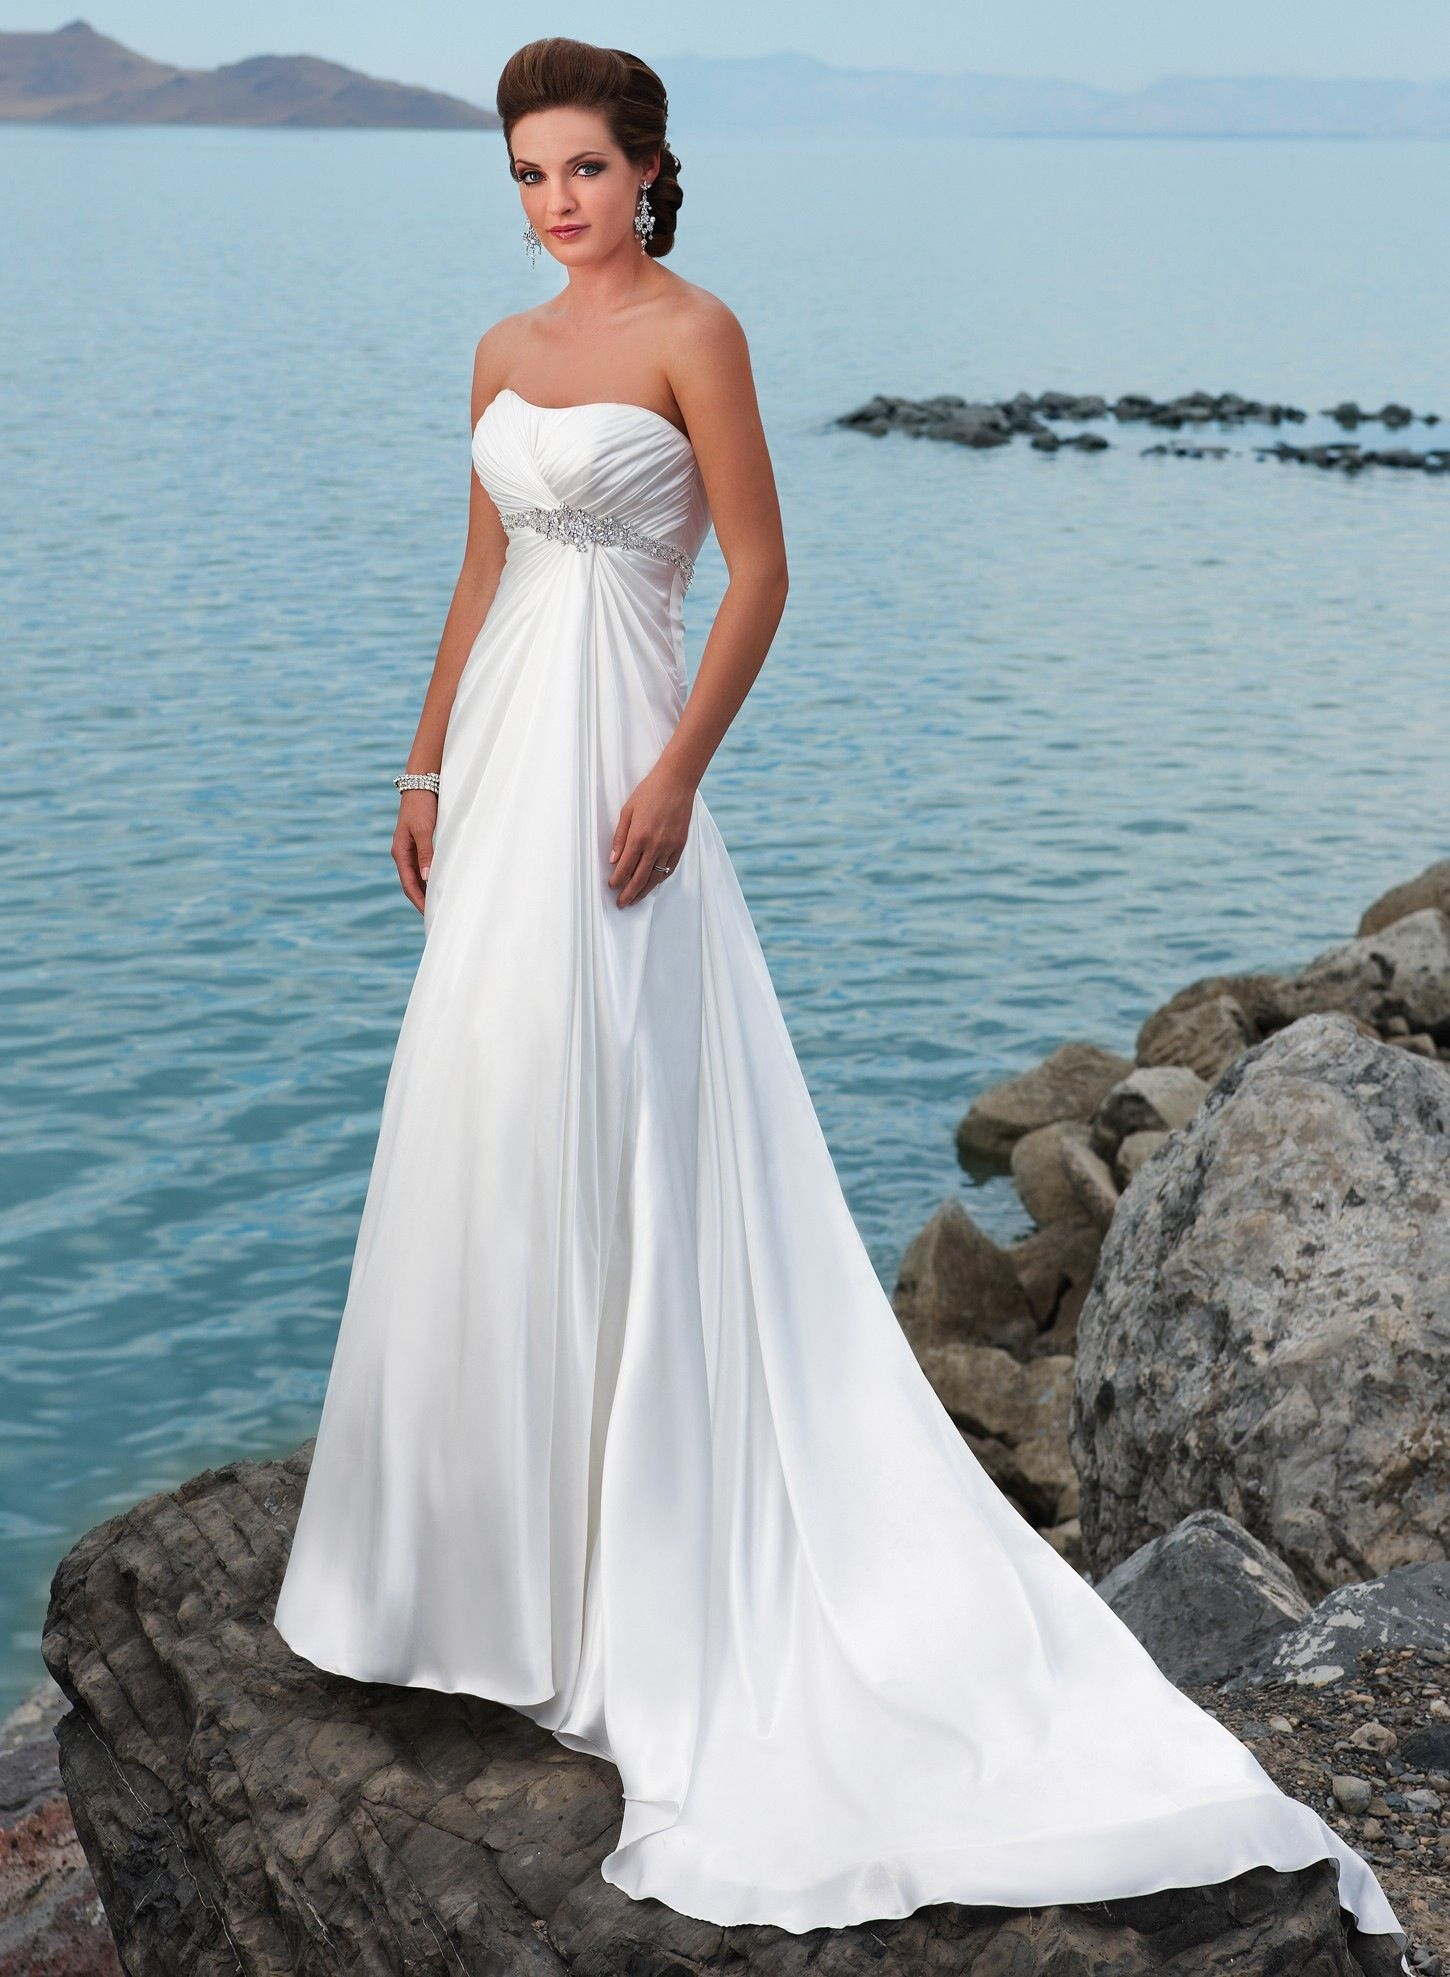 Wedding dress wedding dress ideas pinterest wedding dress